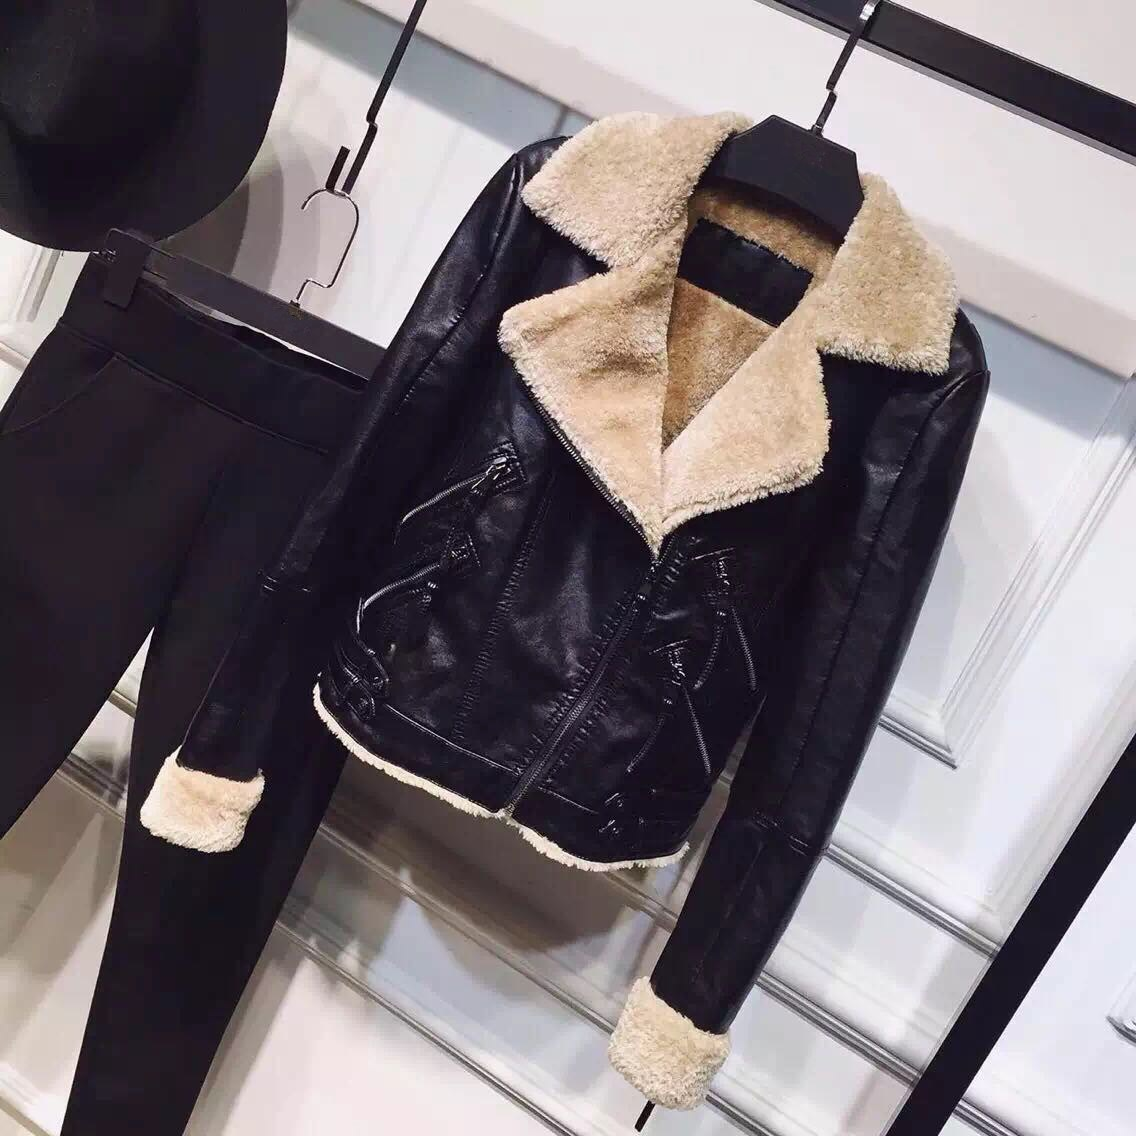 Fashion Faux Lamb PU   Leather   Jacket Autumn Winter Women Warm Thick Lambs Coats Casual Wool Fur Collar Crop Motorcycle Outerwear